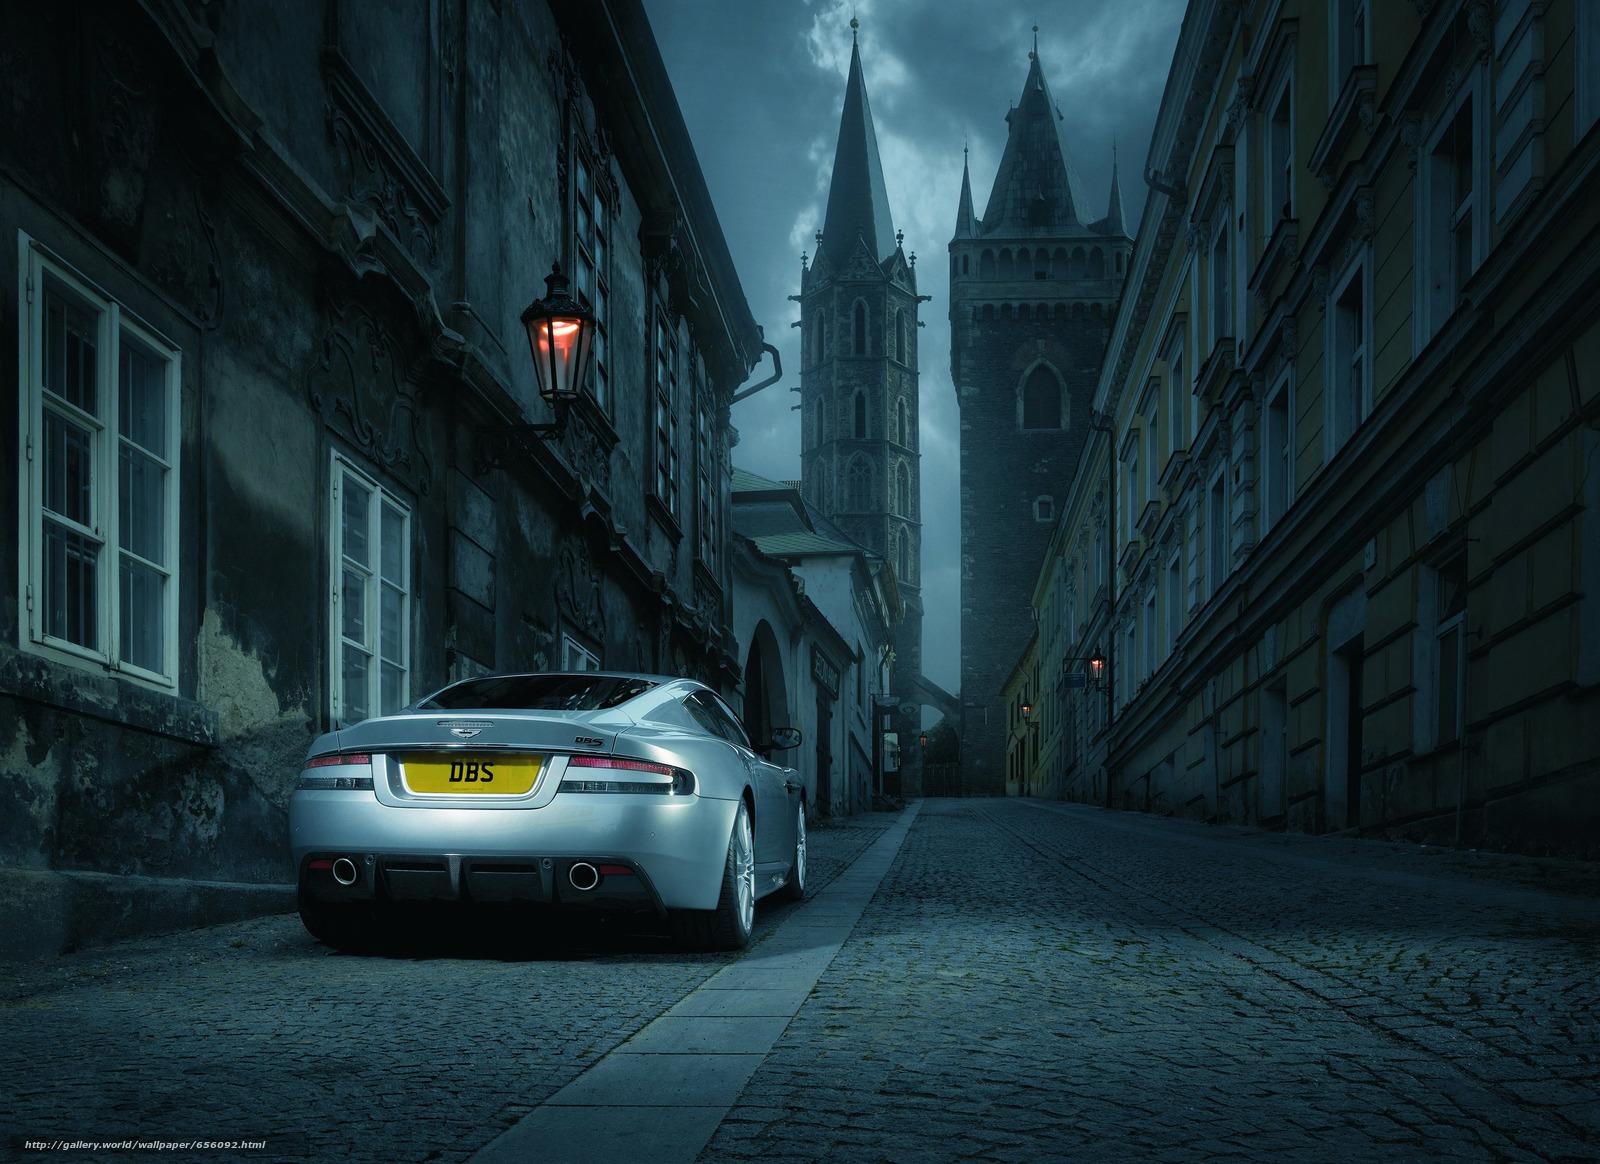 Descargar gratis Aston Martin,  máquina,  coche Fondos de escritorio en la resolucin 2750x2000 — imagen №656092